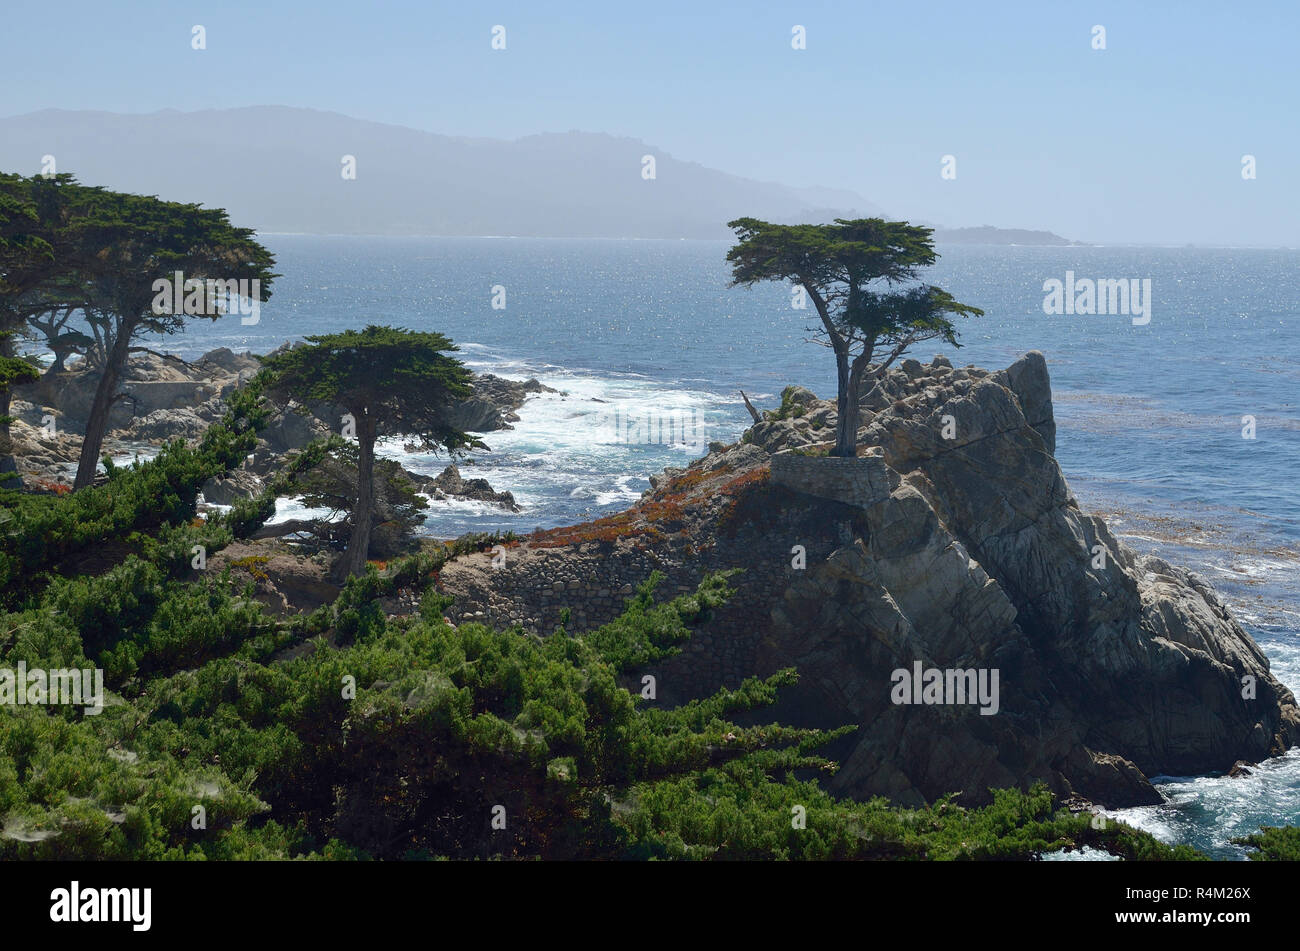 Lone Monterey cypress tree, Pebble Beach, California, USA Stock Photo